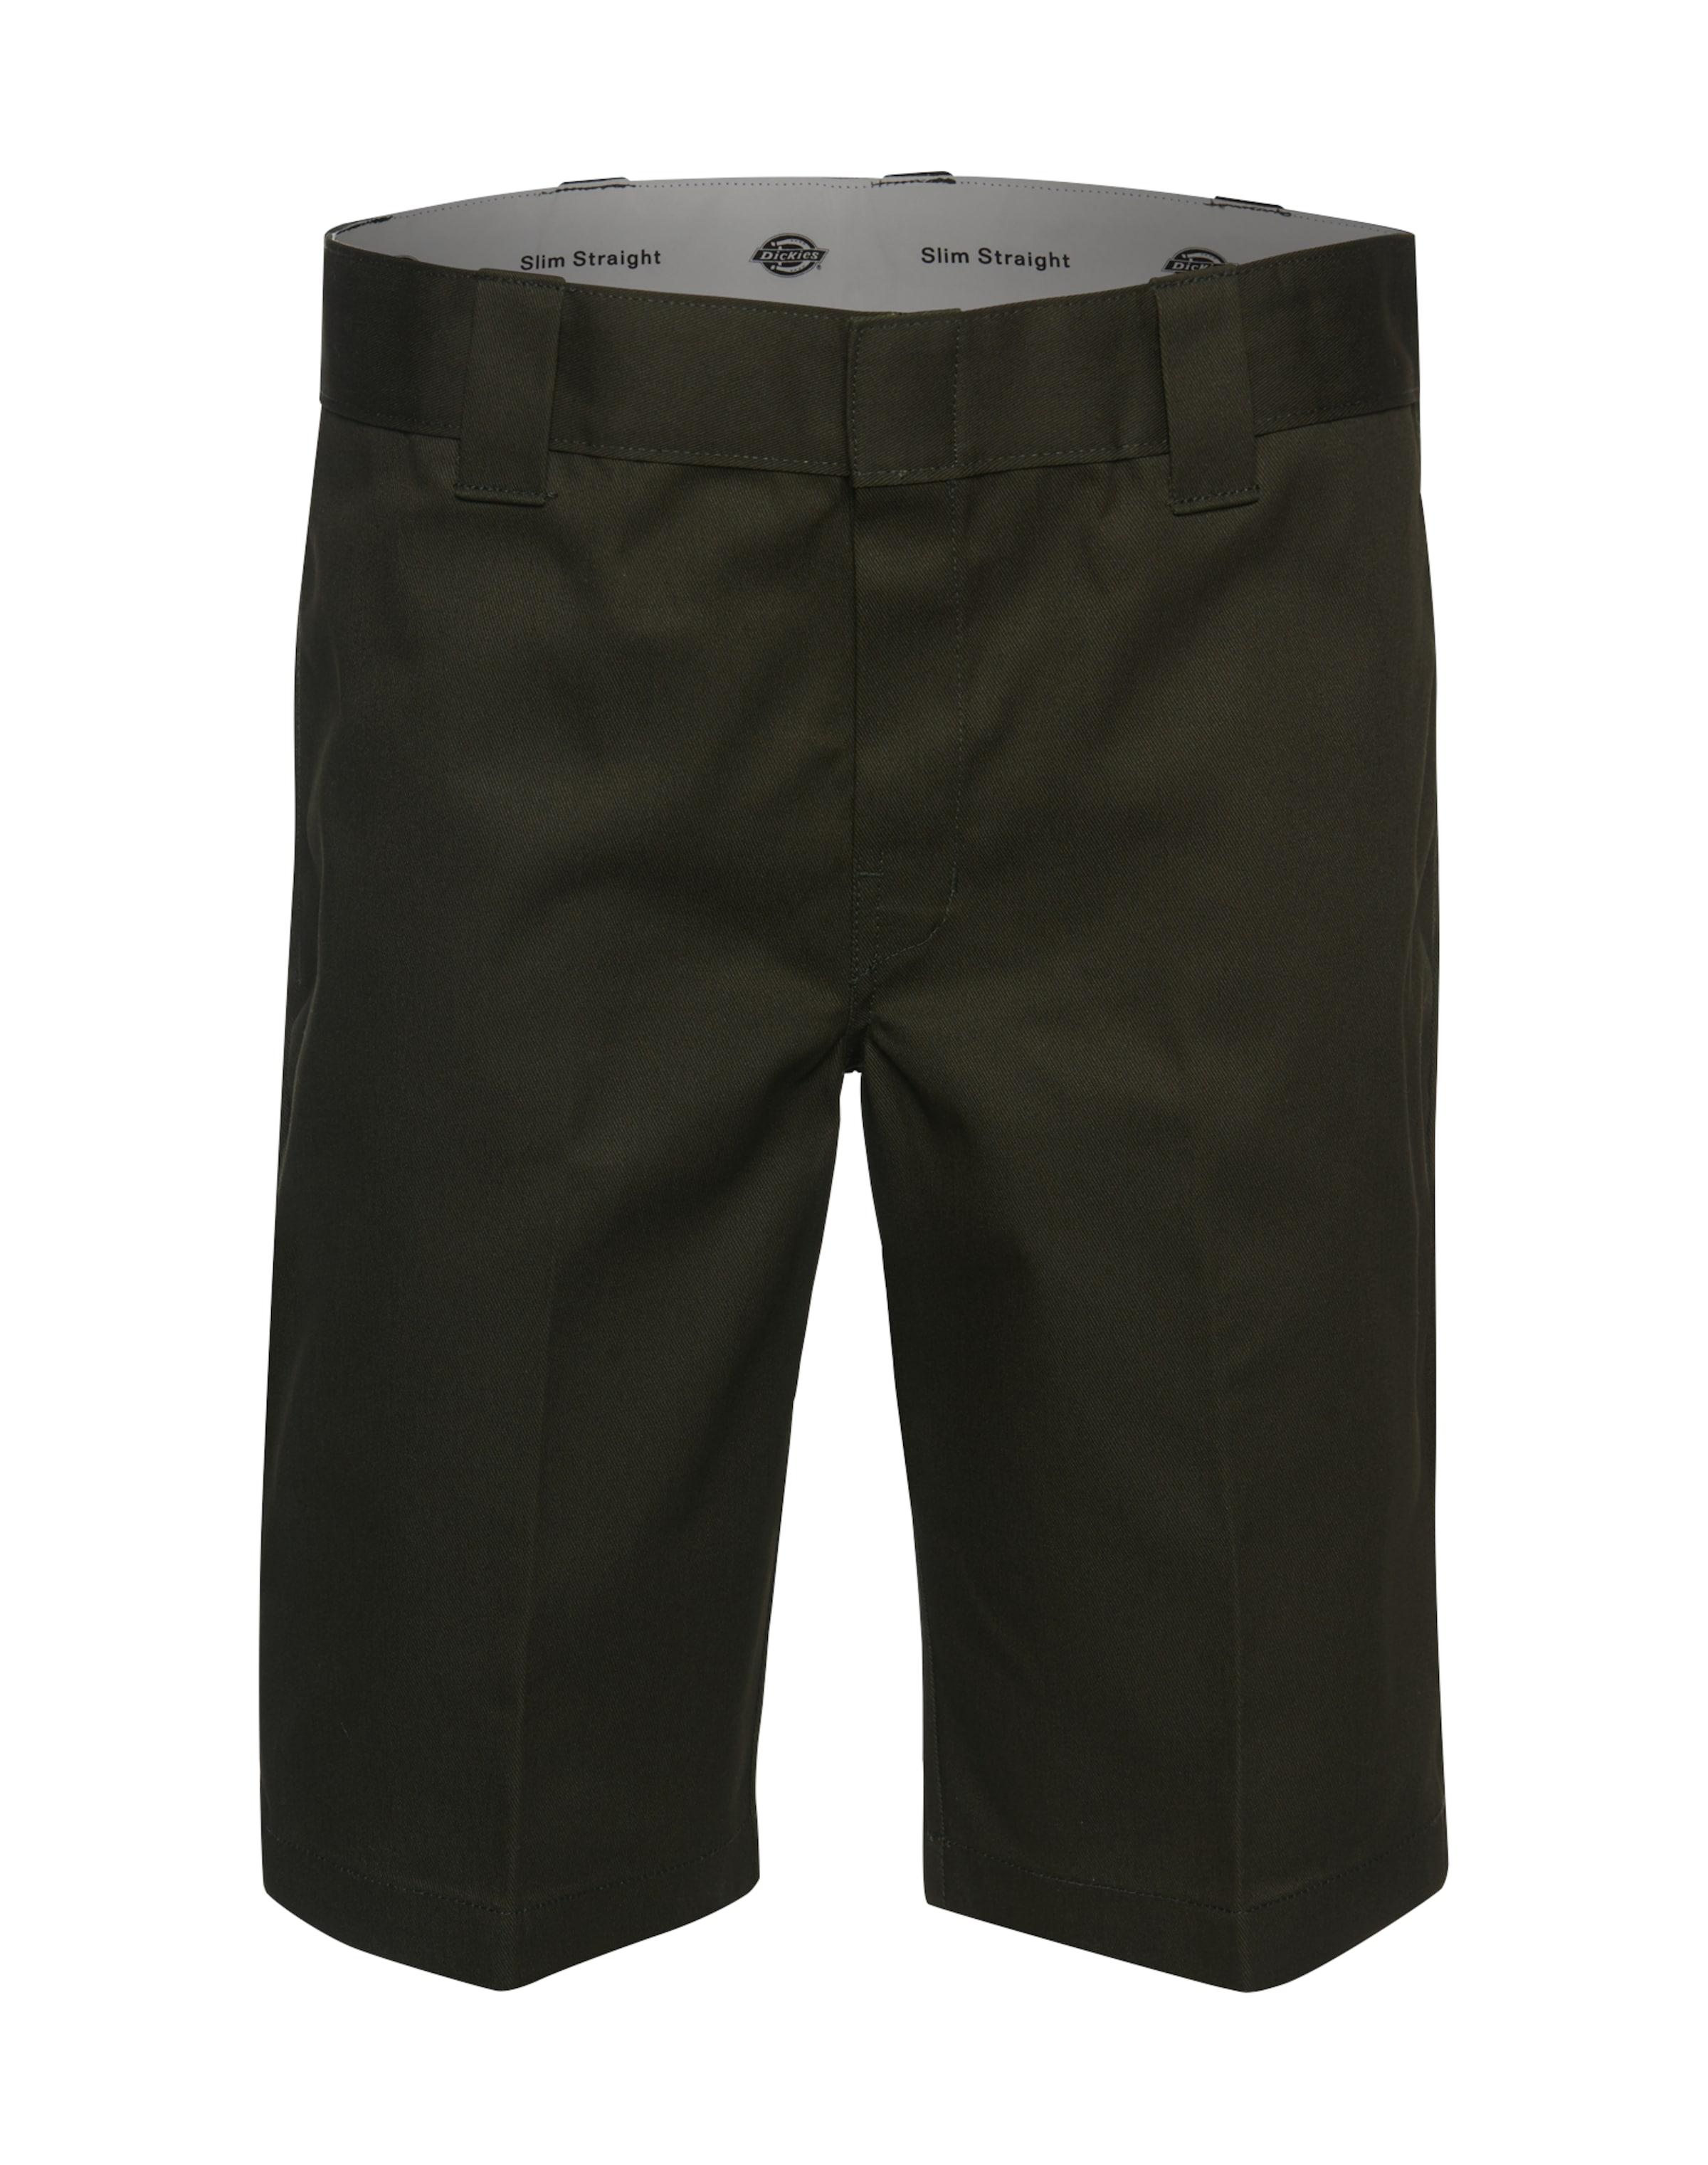 En Olive Pantalon Dickies Pantalon Pantalon Dickies Olive Pantalon Dickies En Olive En Dickies TulF3cK1J